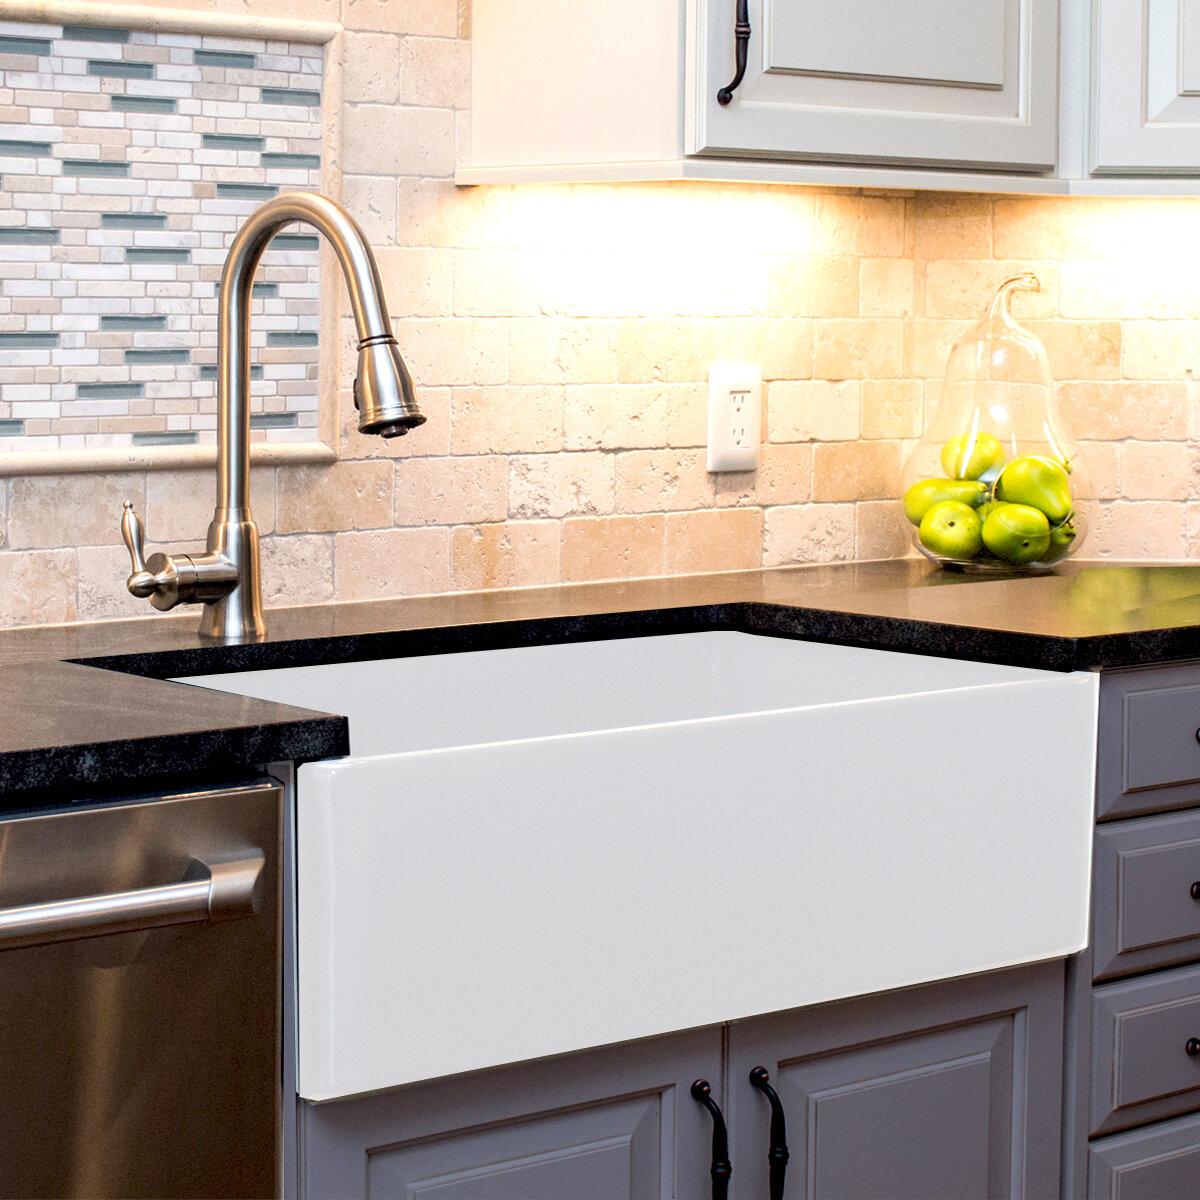 cape 36 x 19 farmhouse apron kitchen sink